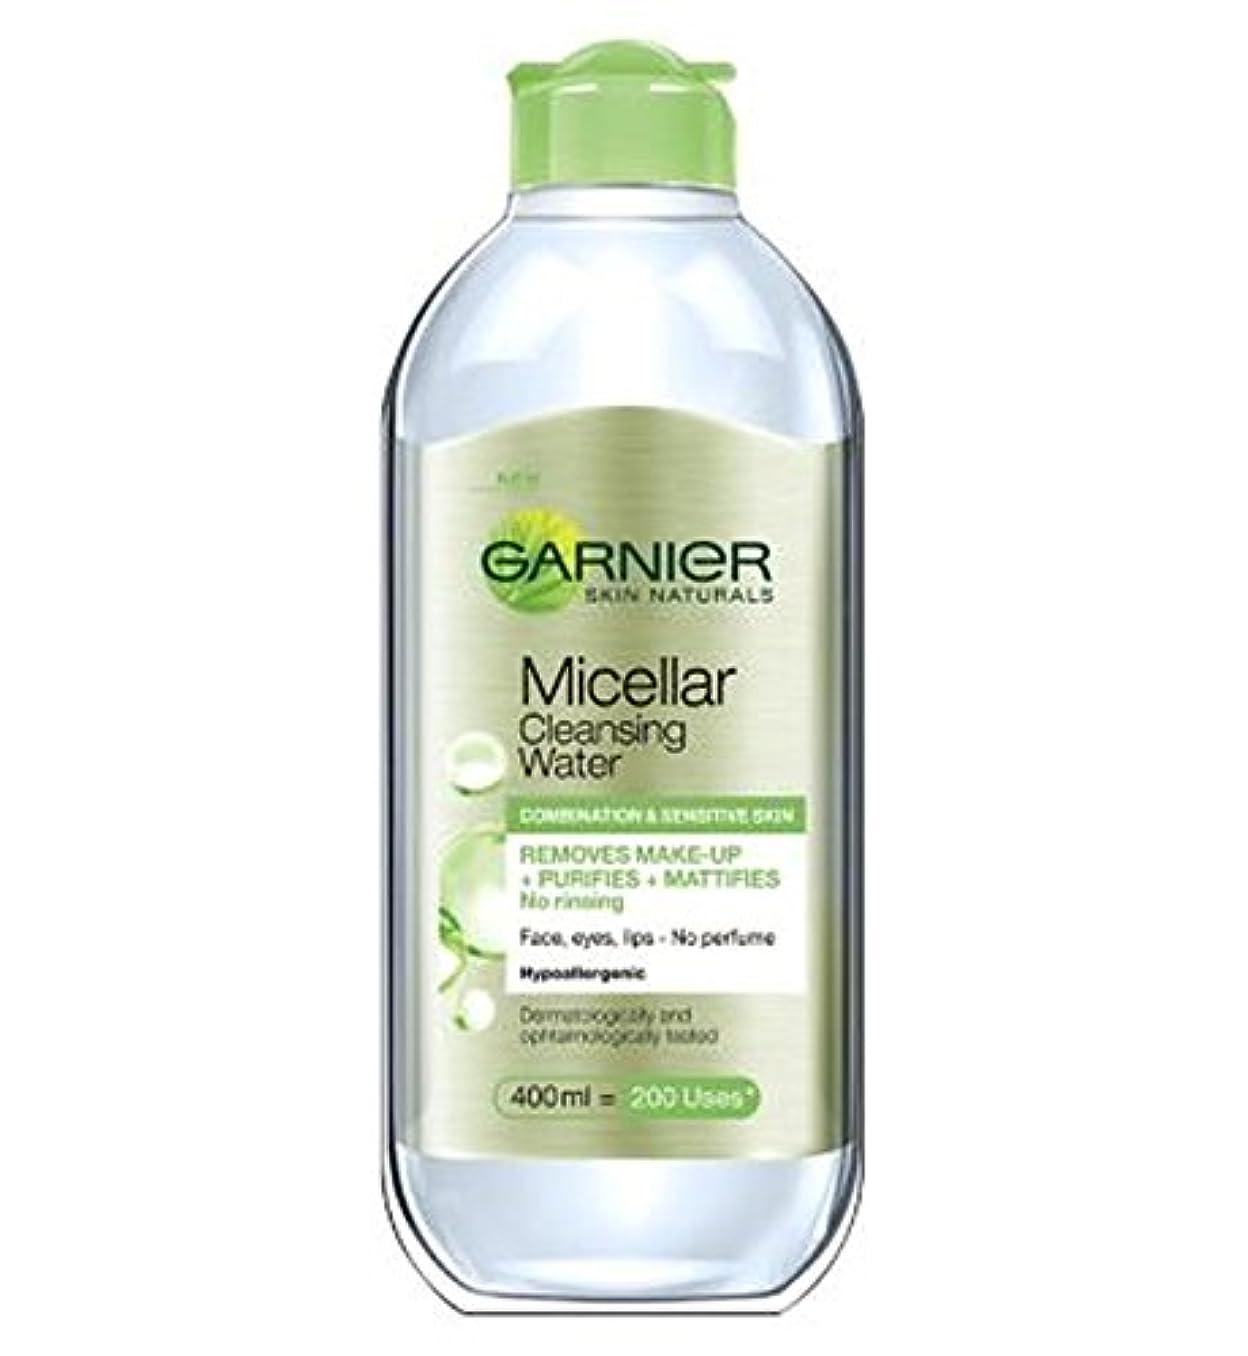 Garnier Skin Naturals Micellar Cleansing Water Combination & Sensitive Skin 400ml - ガルニエ皮膚ナチュラルミセル洗浄水の組み合わせ&敏感肌用...